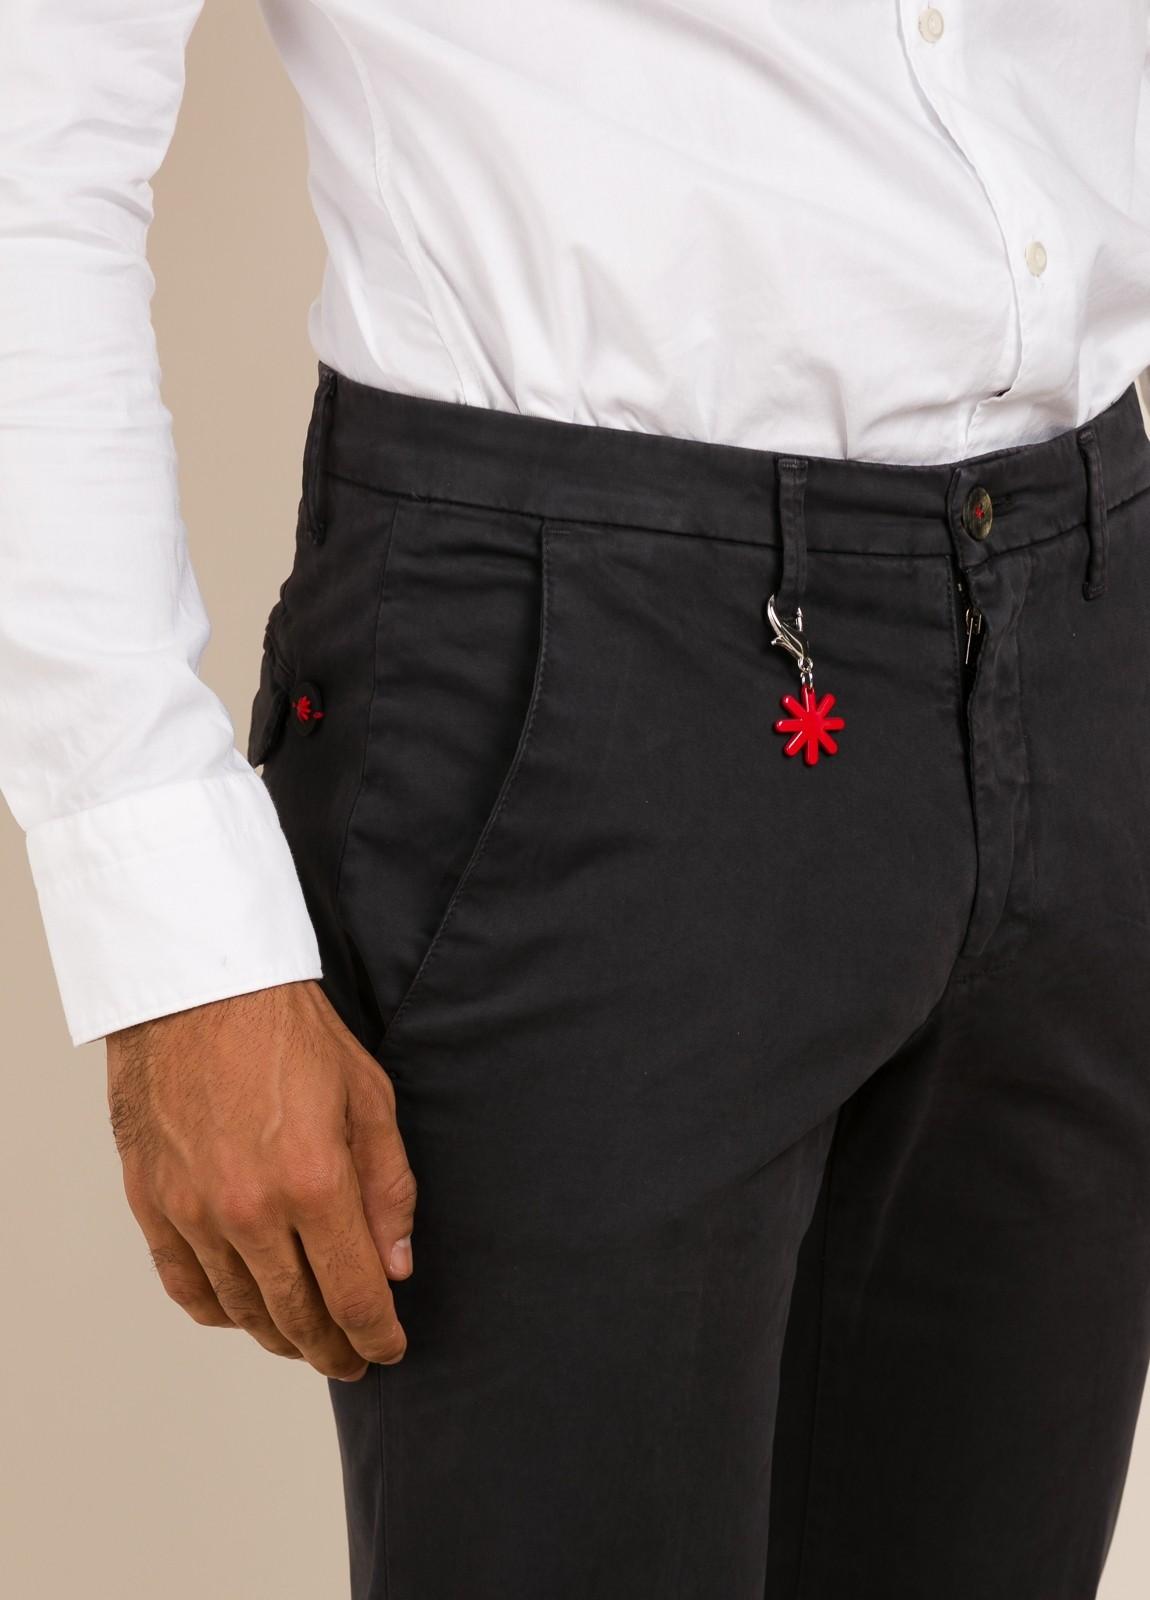 Pantalón MANUEL RITZ gris oscuro - Ítem2